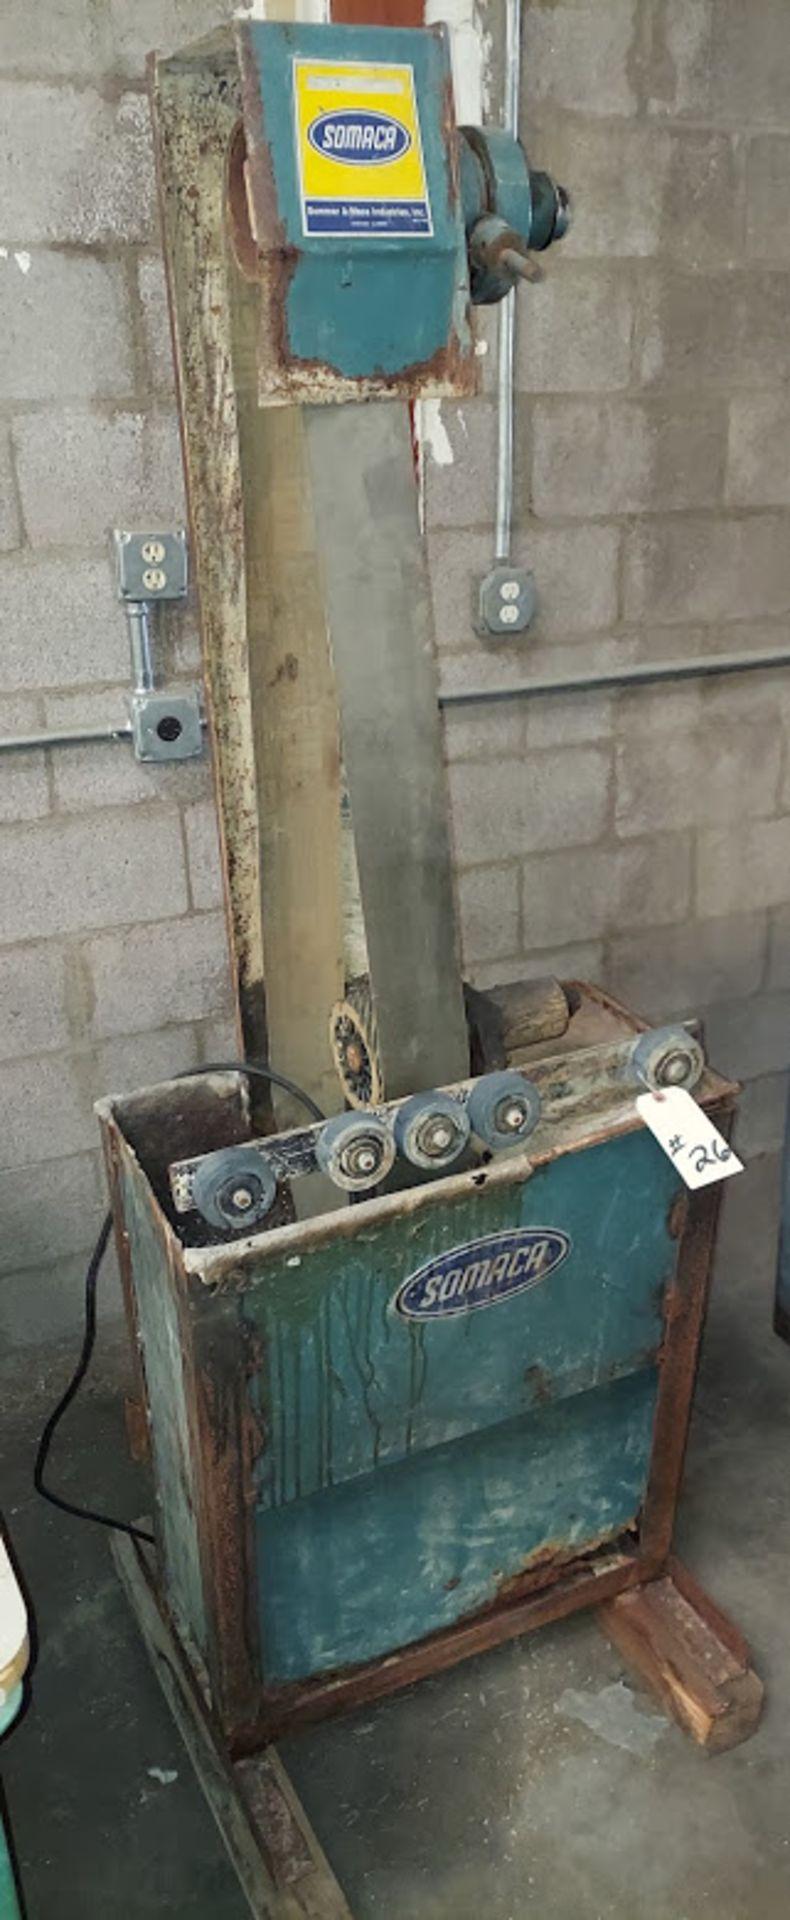 "Somaca 106"" Wet Abrasive Belt Machine with Roller Platen, Model # BM-1060-RP, 115 Volts - Image 2 of 4"